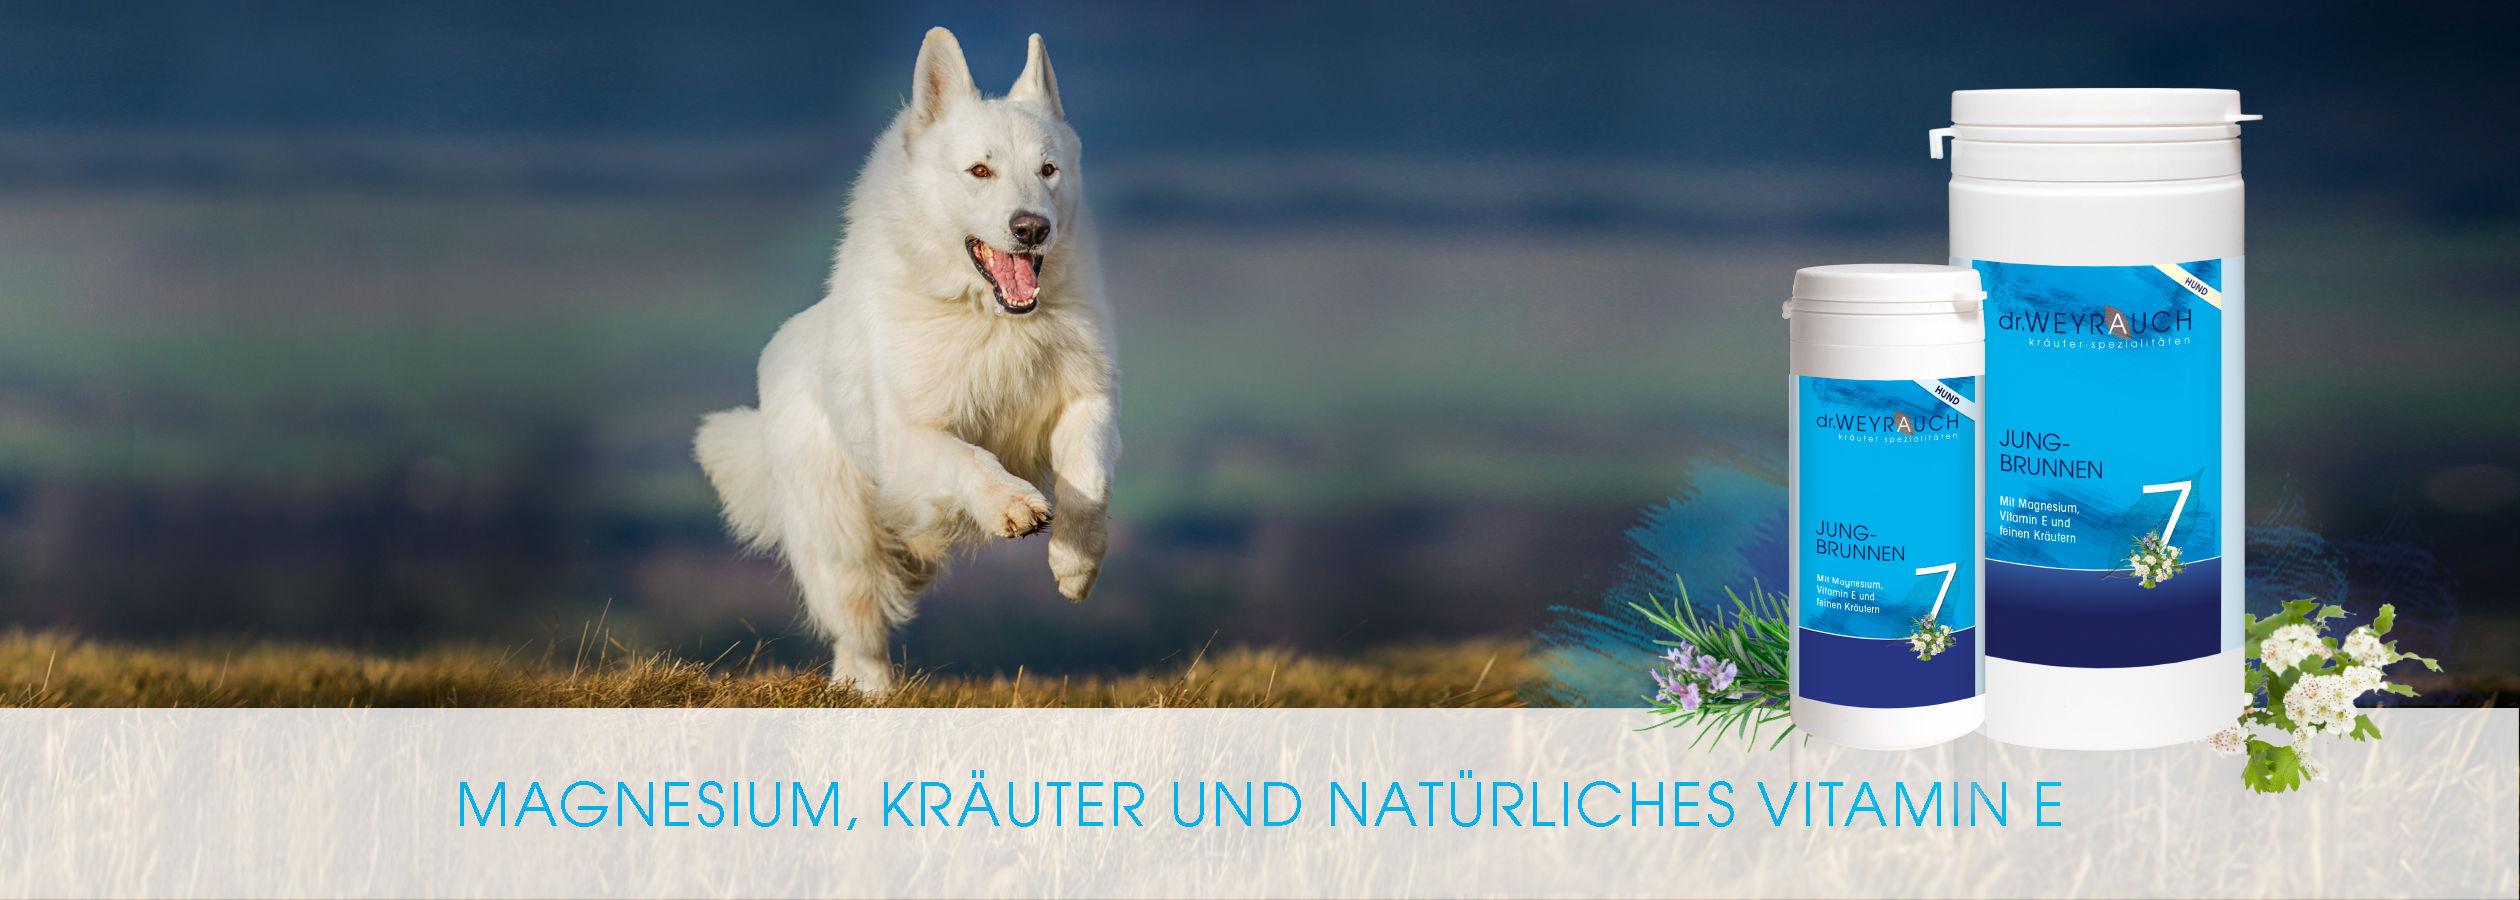 HEADER-2017-Jungbrunnen-Hund